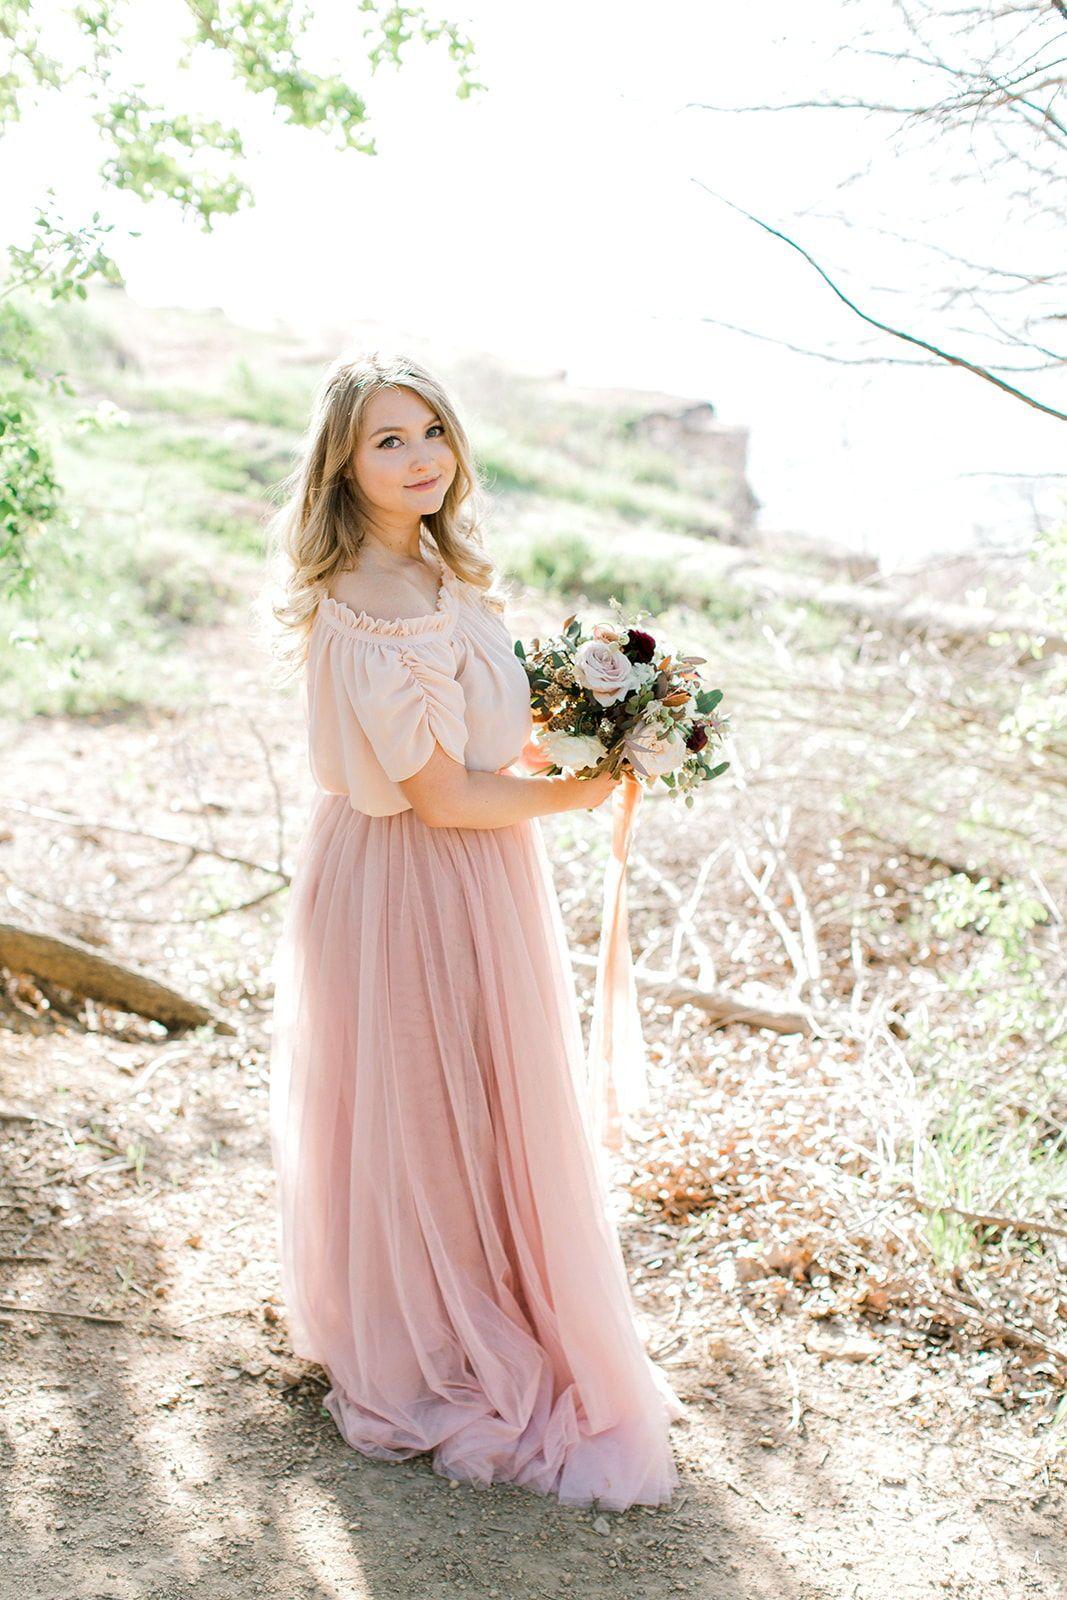 Flowy off the shoulder boho wedding dress for destination beach